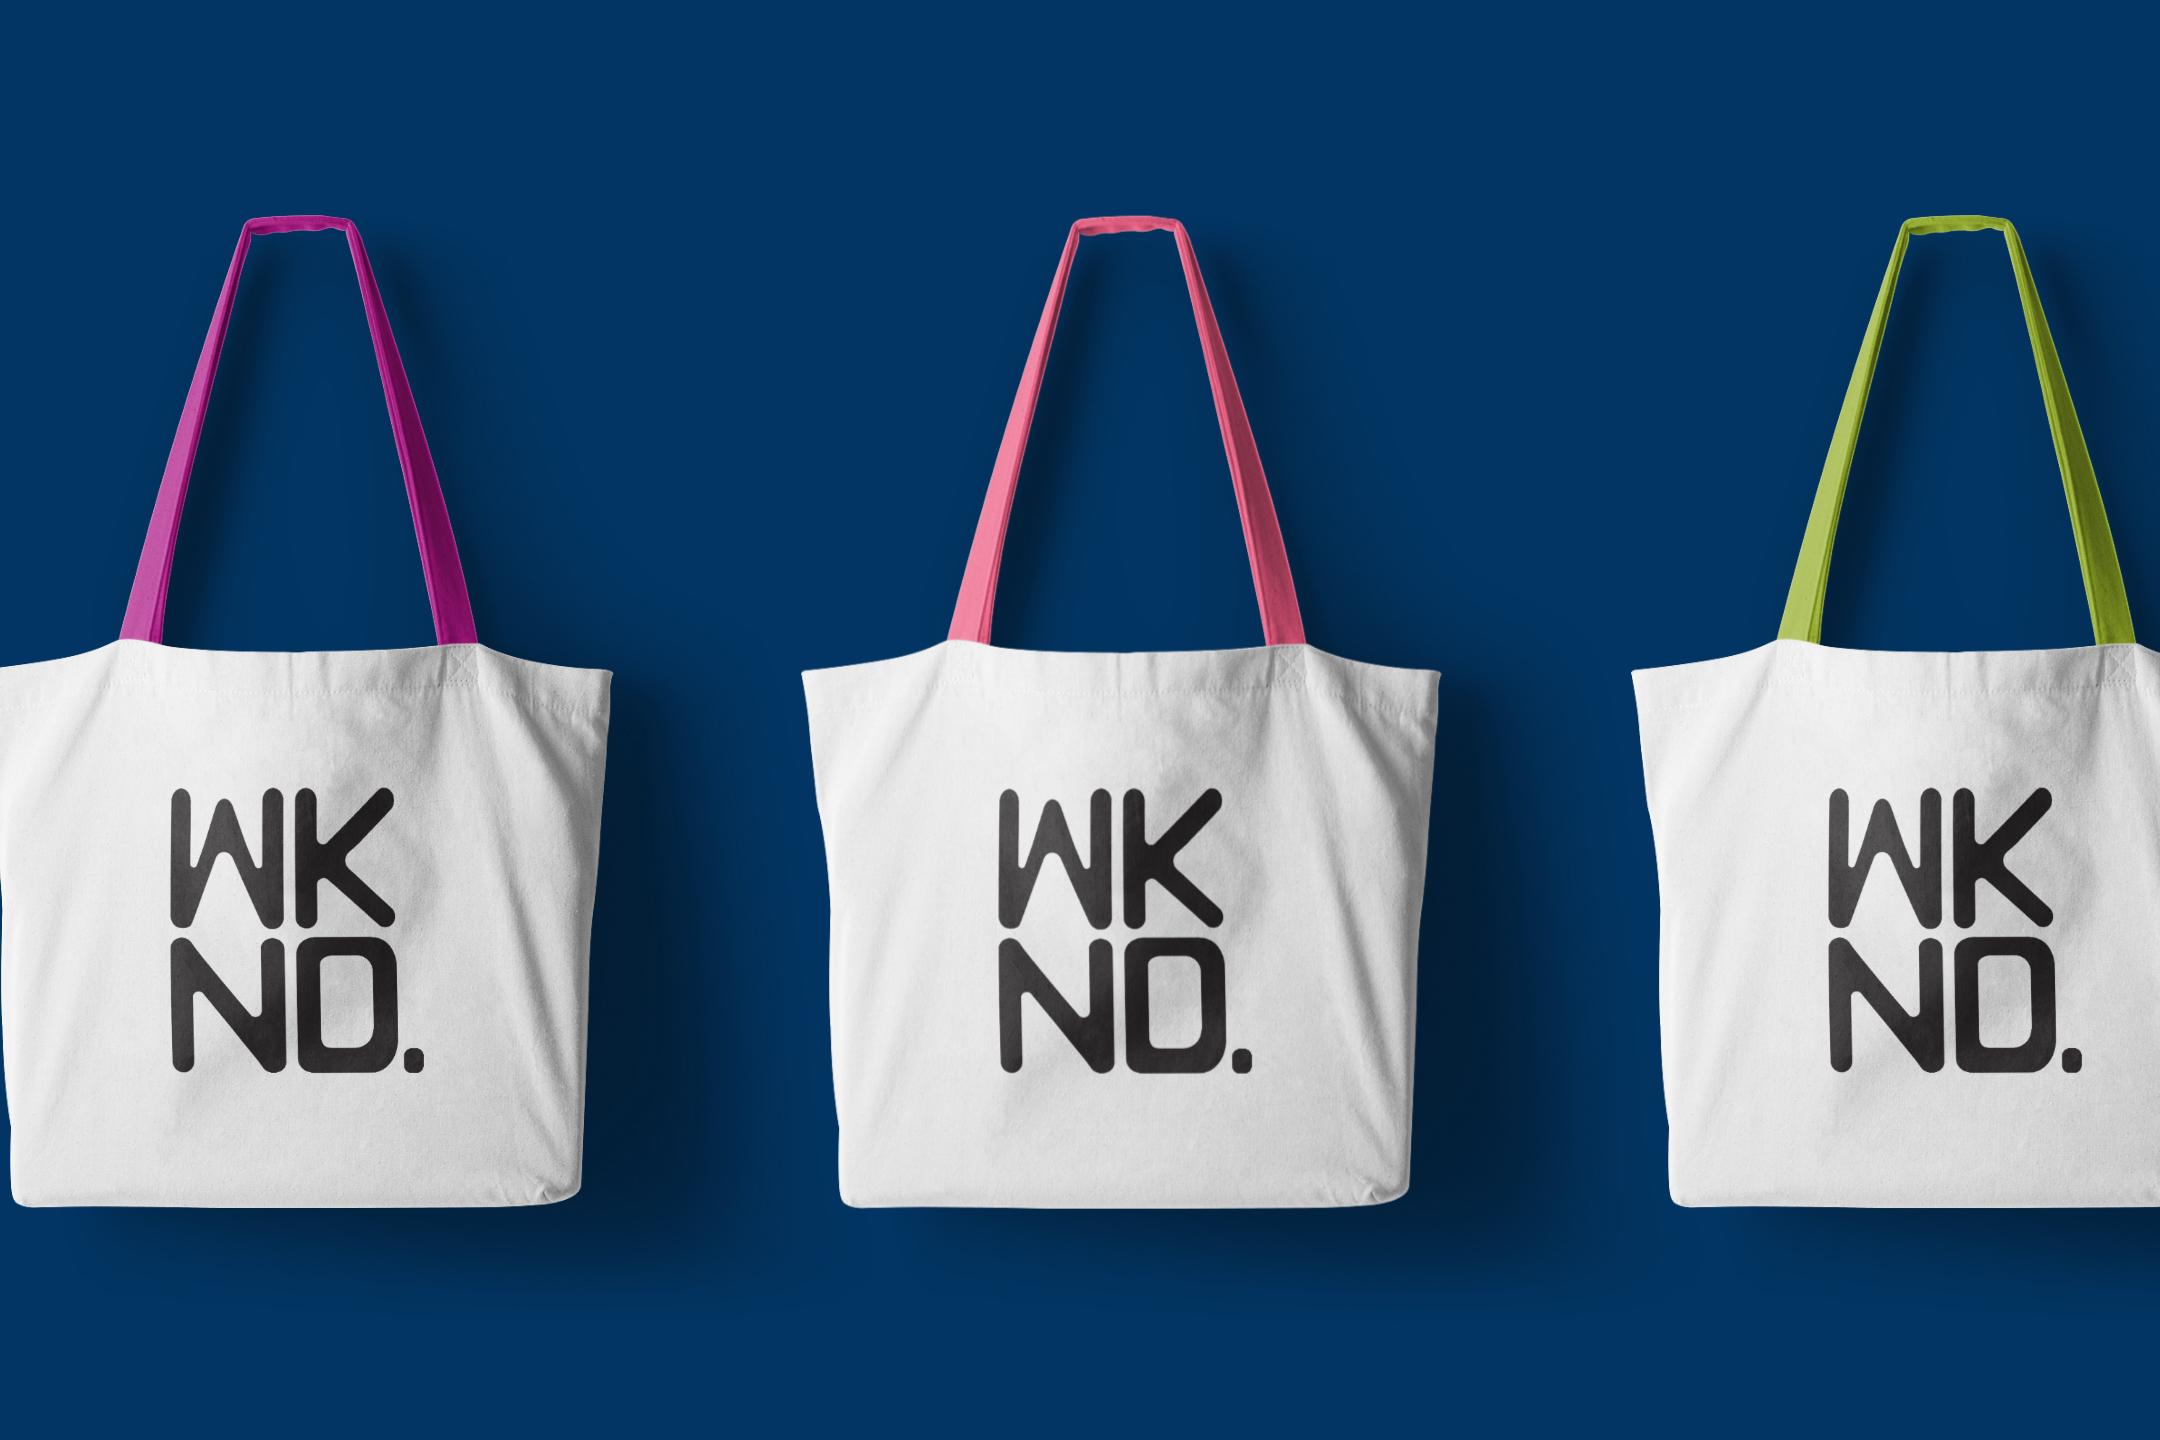 wknd bag logo mockup